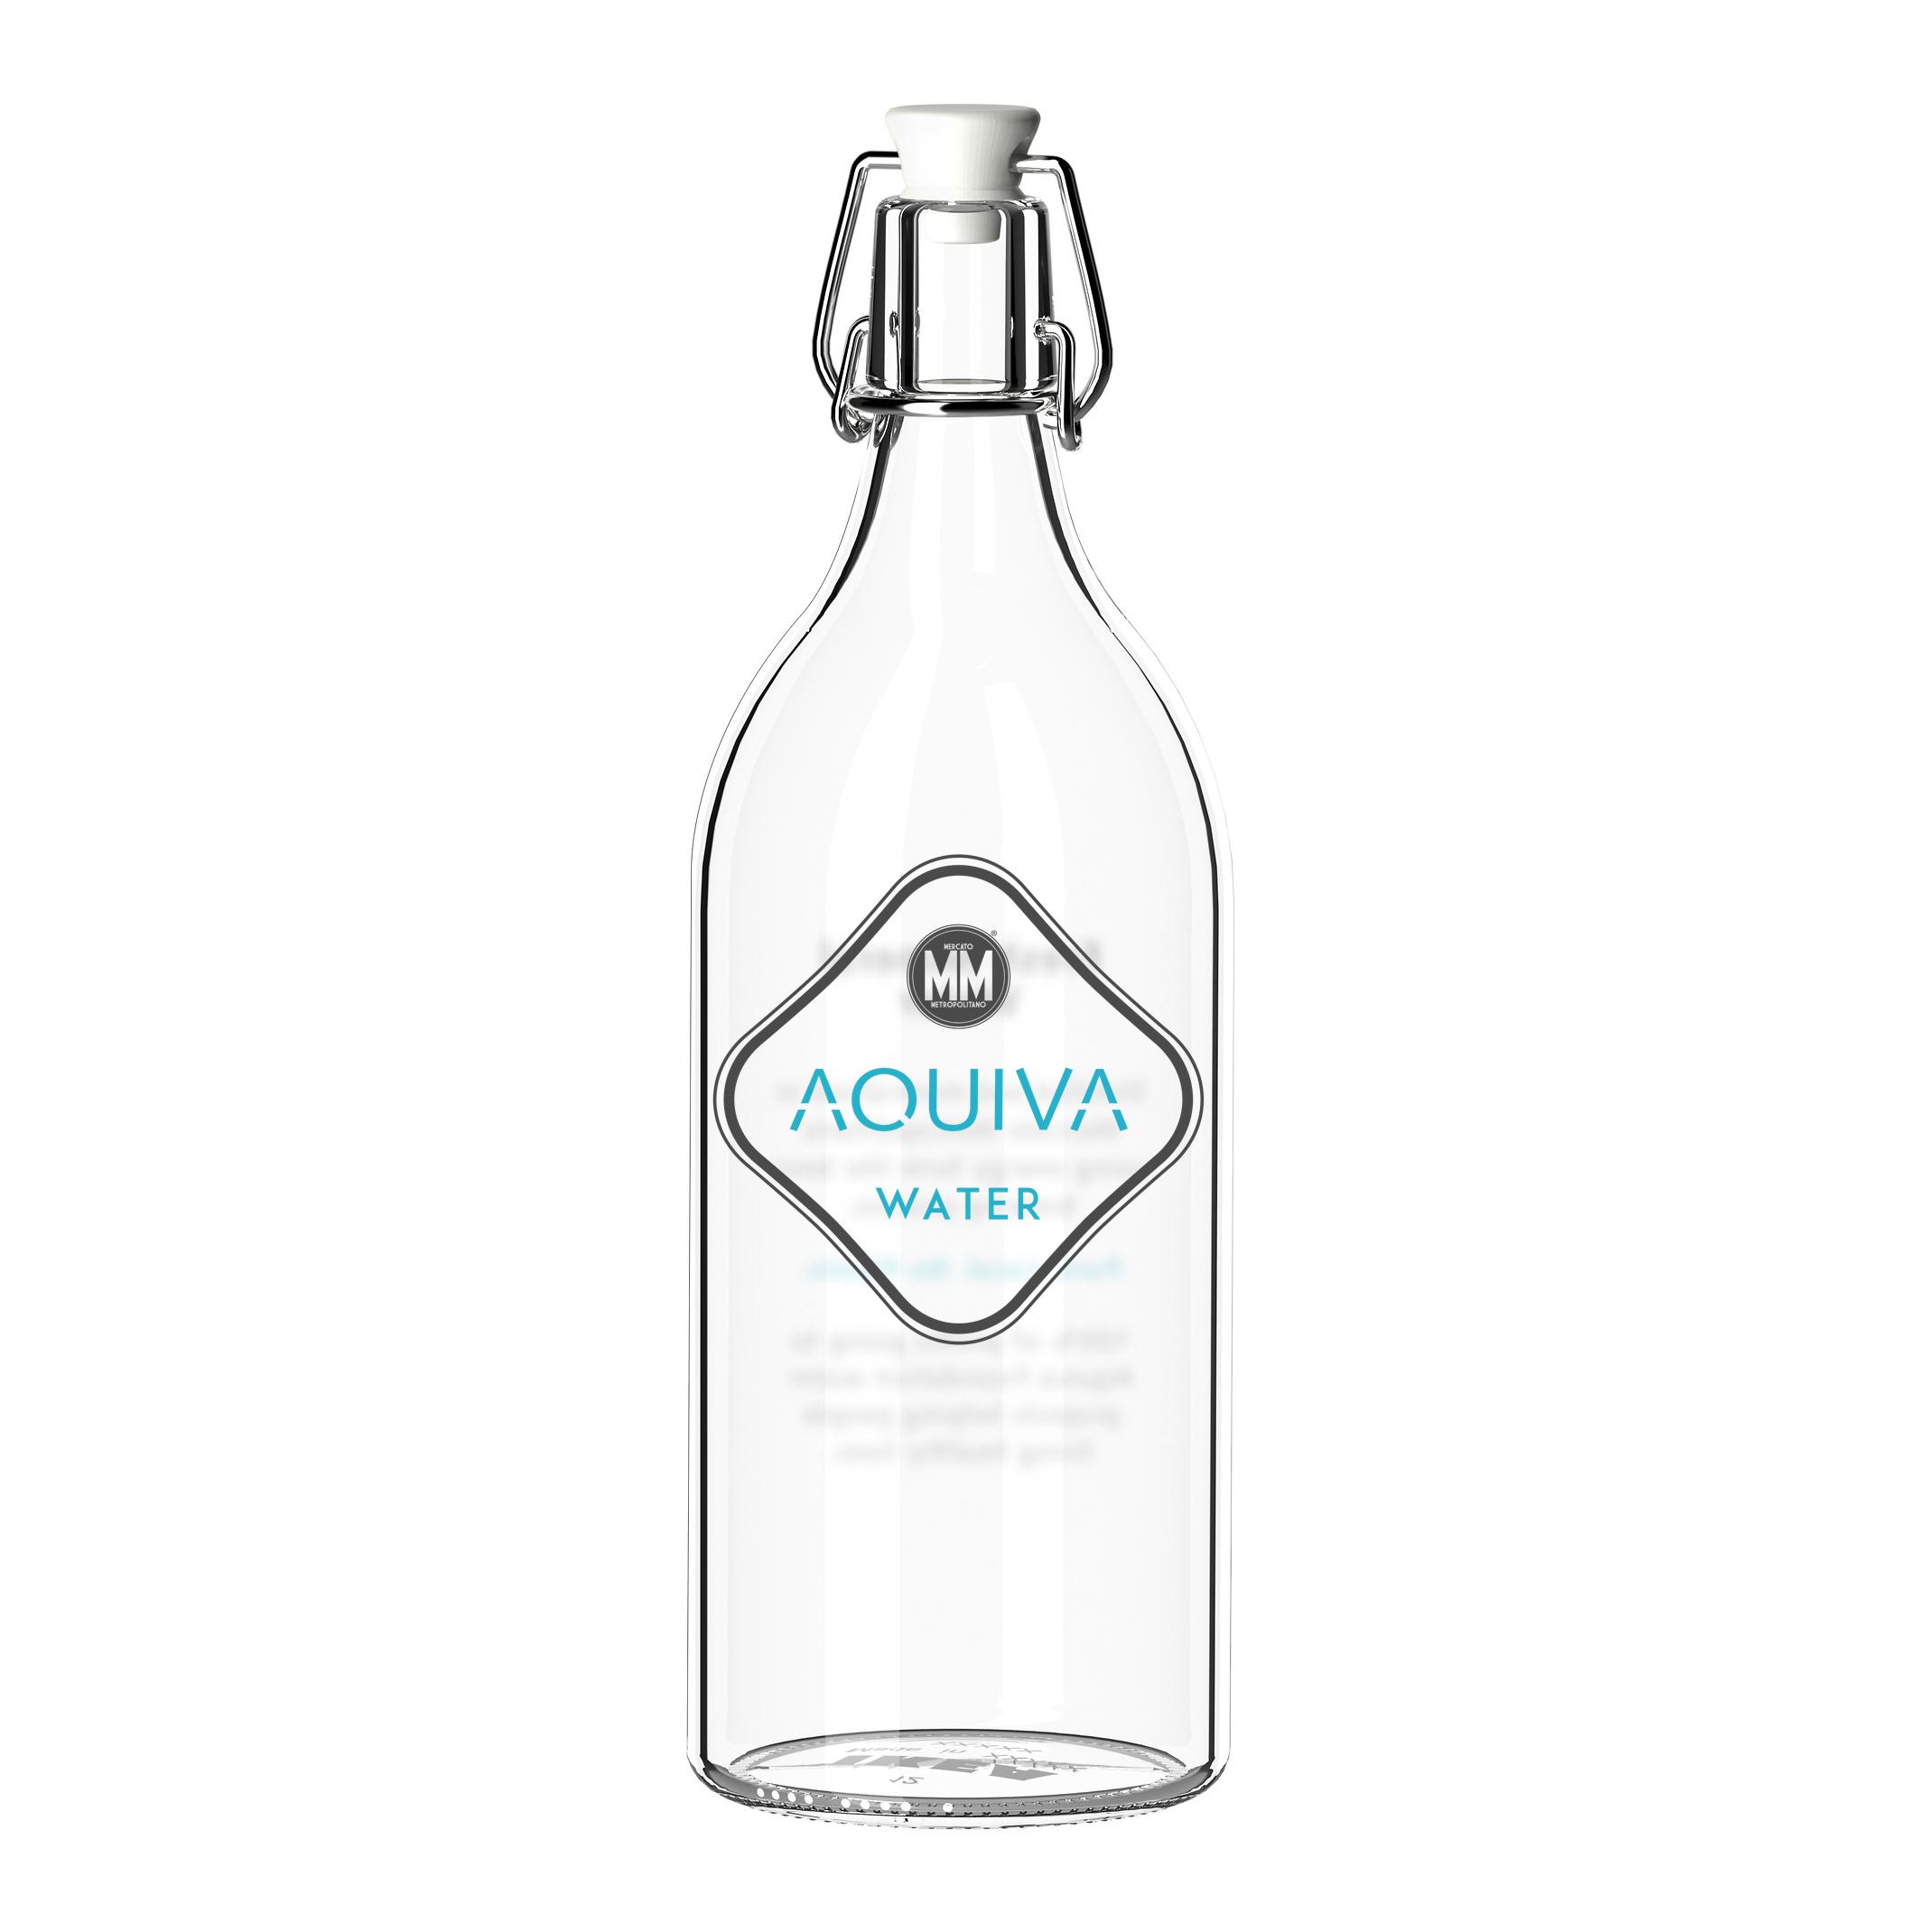 Mineralisation - Reusable glass bottles